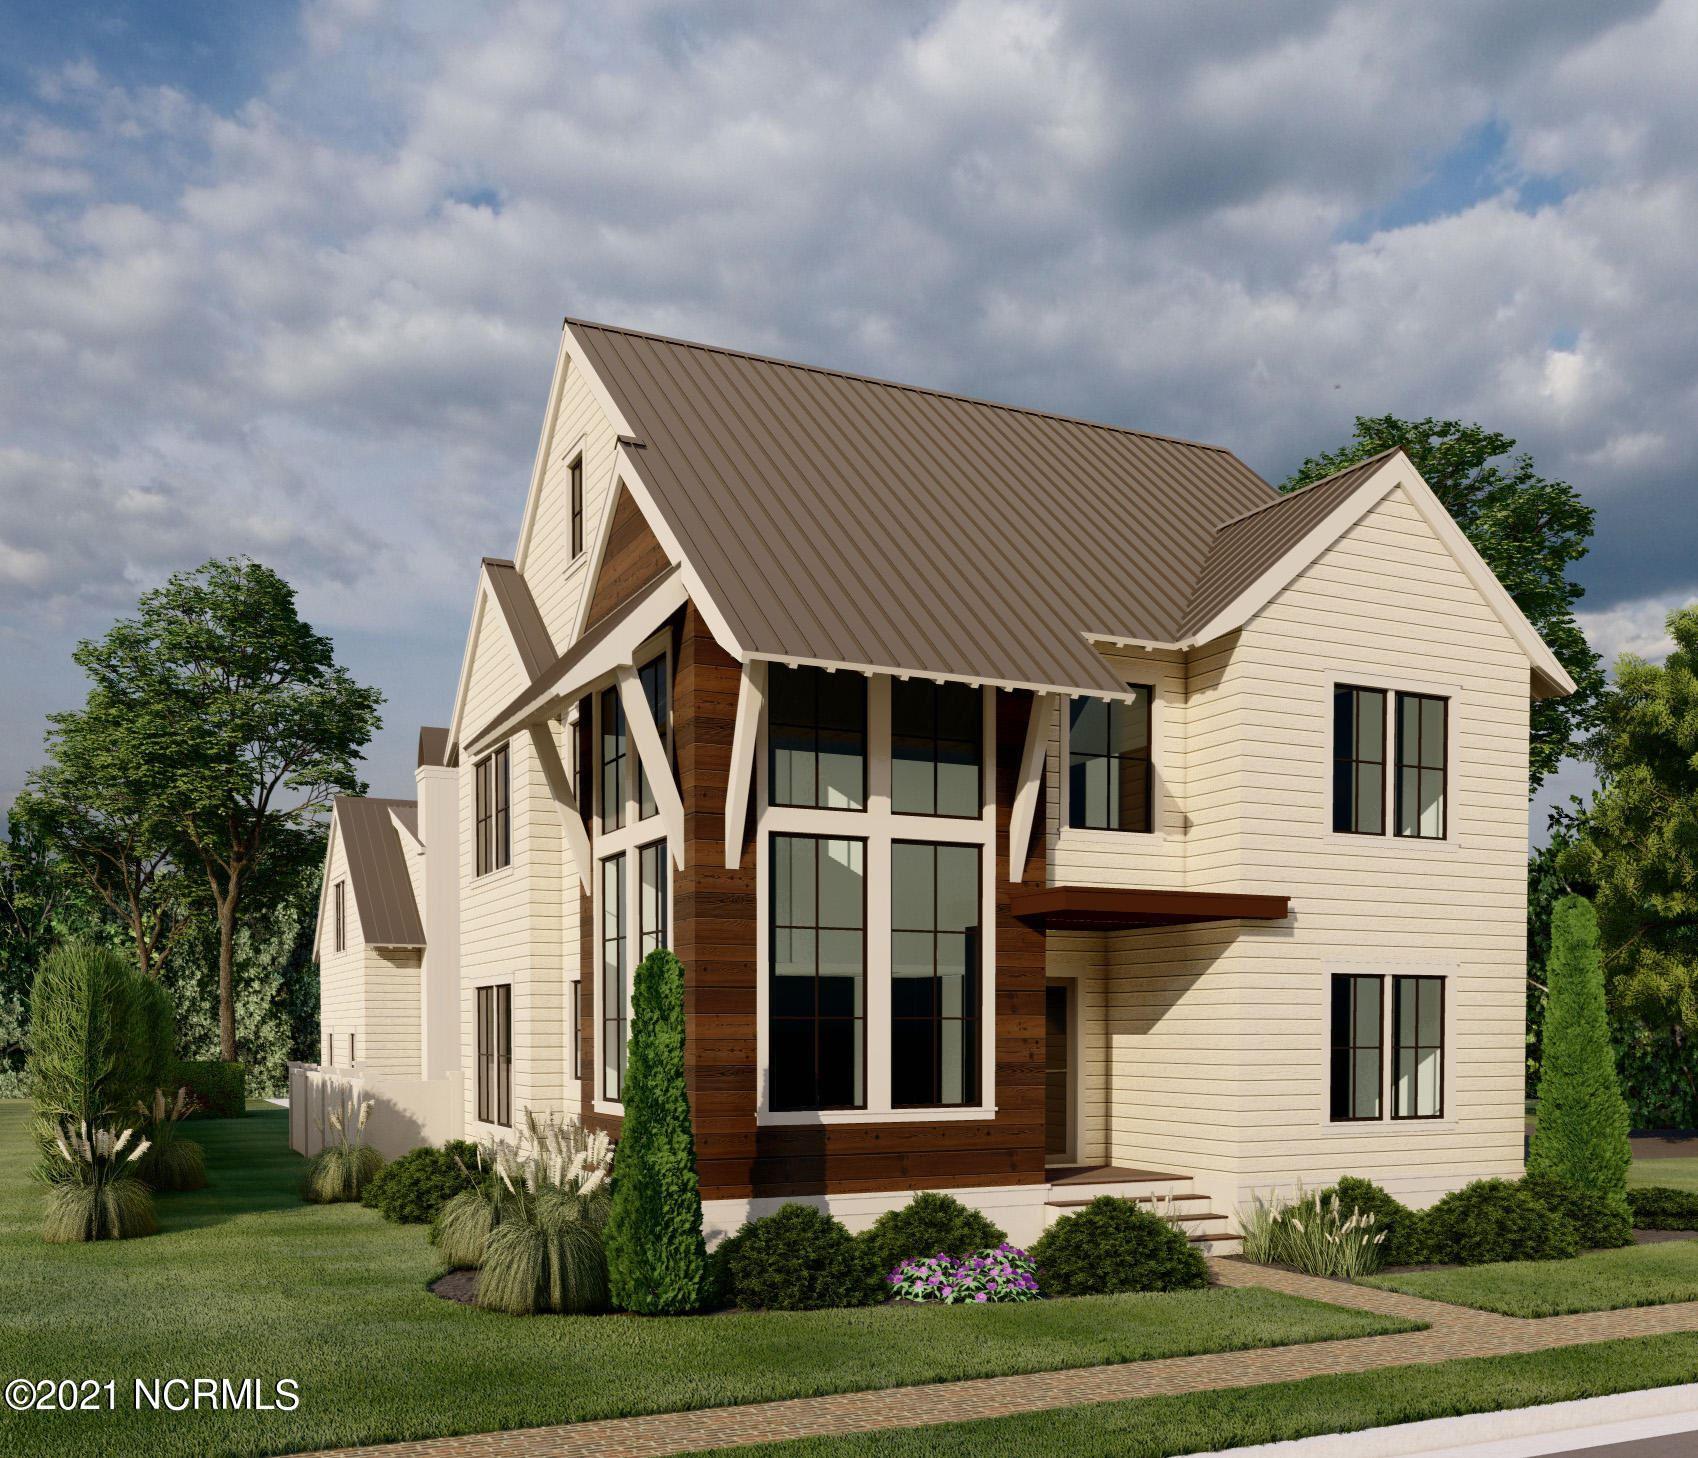 Photo for 3759 Pergola Terrace, Wilmington, NC 28403 (MLS # 100242175)